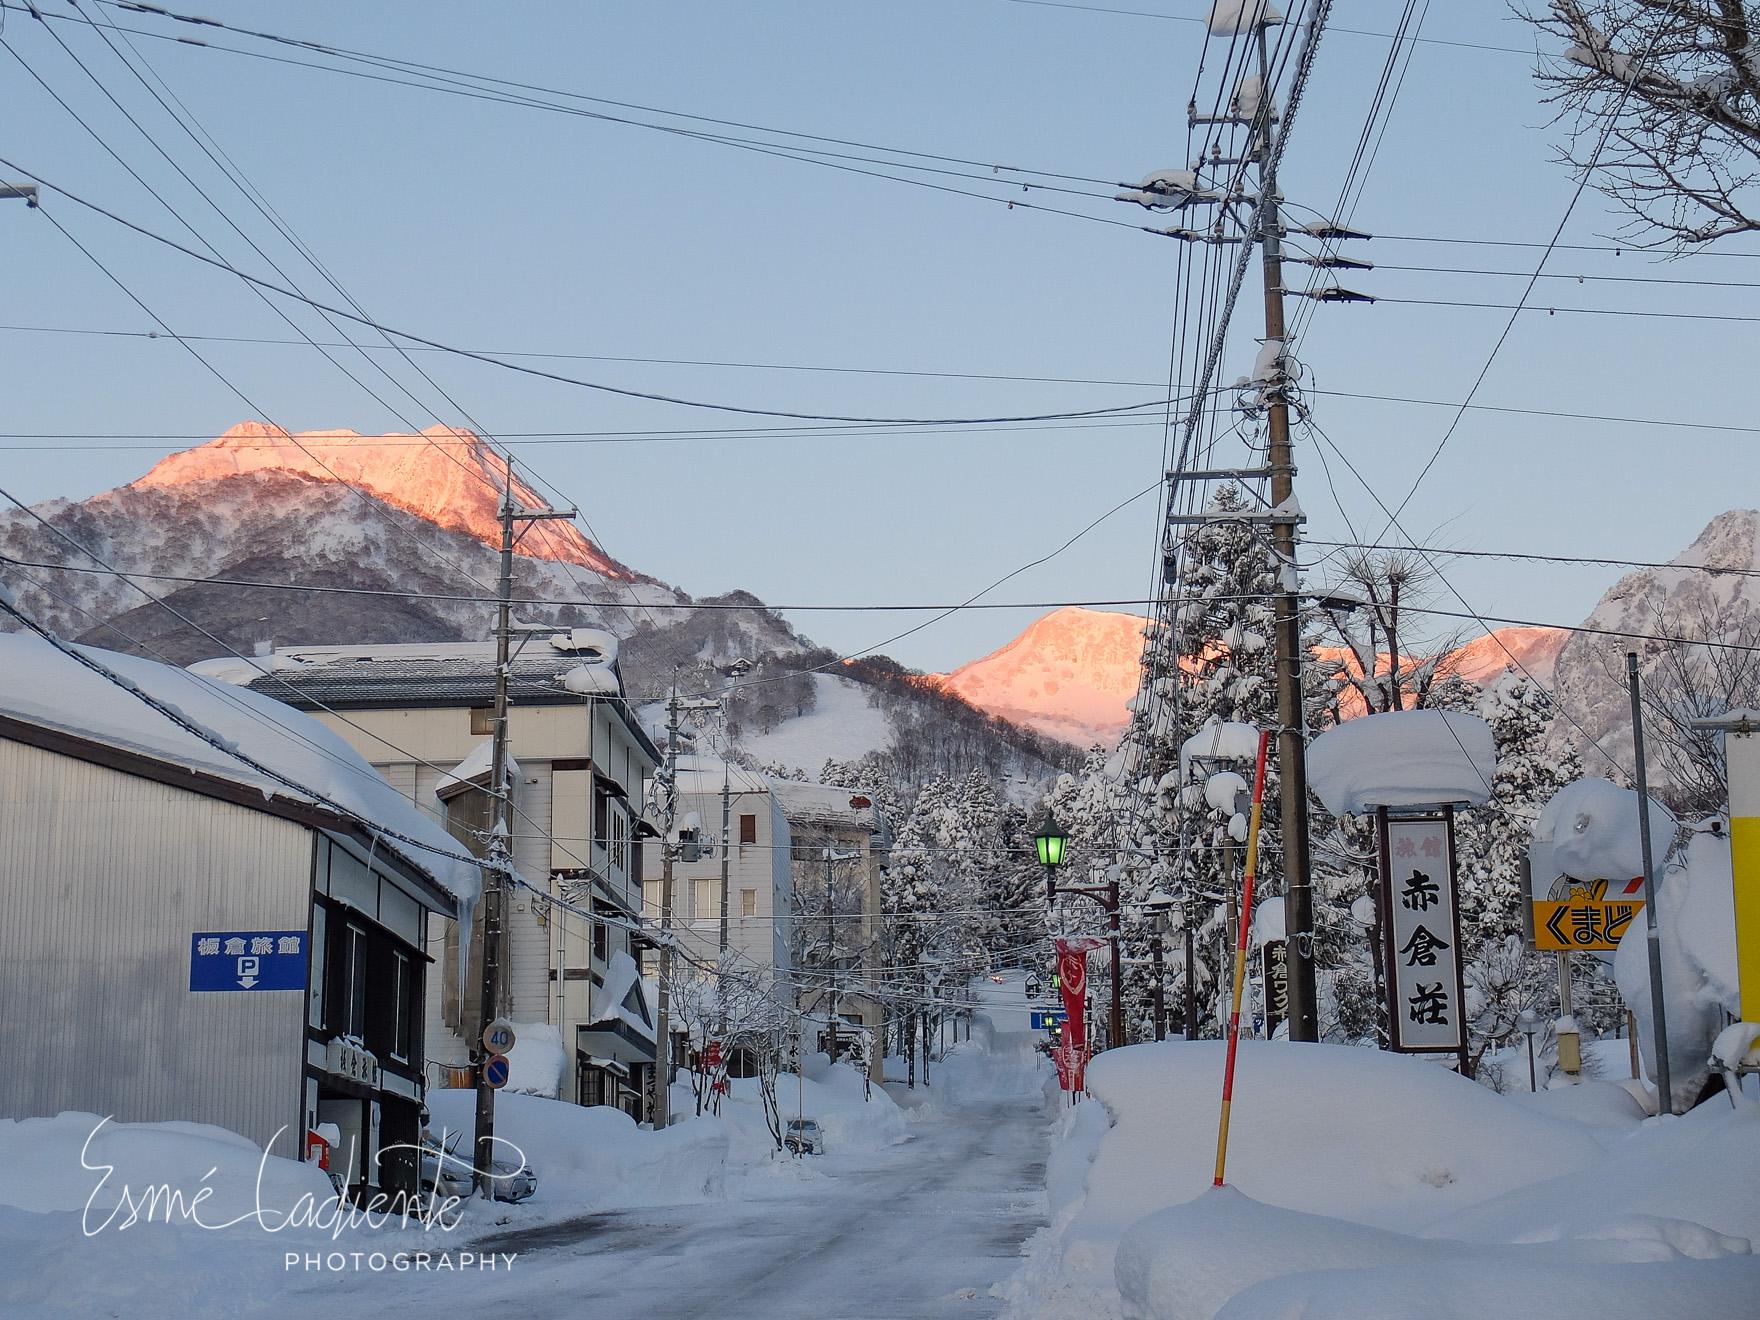 The streets of Myoko Akakura at dawn just as the sun began to rise illuminating Mount Myoko.